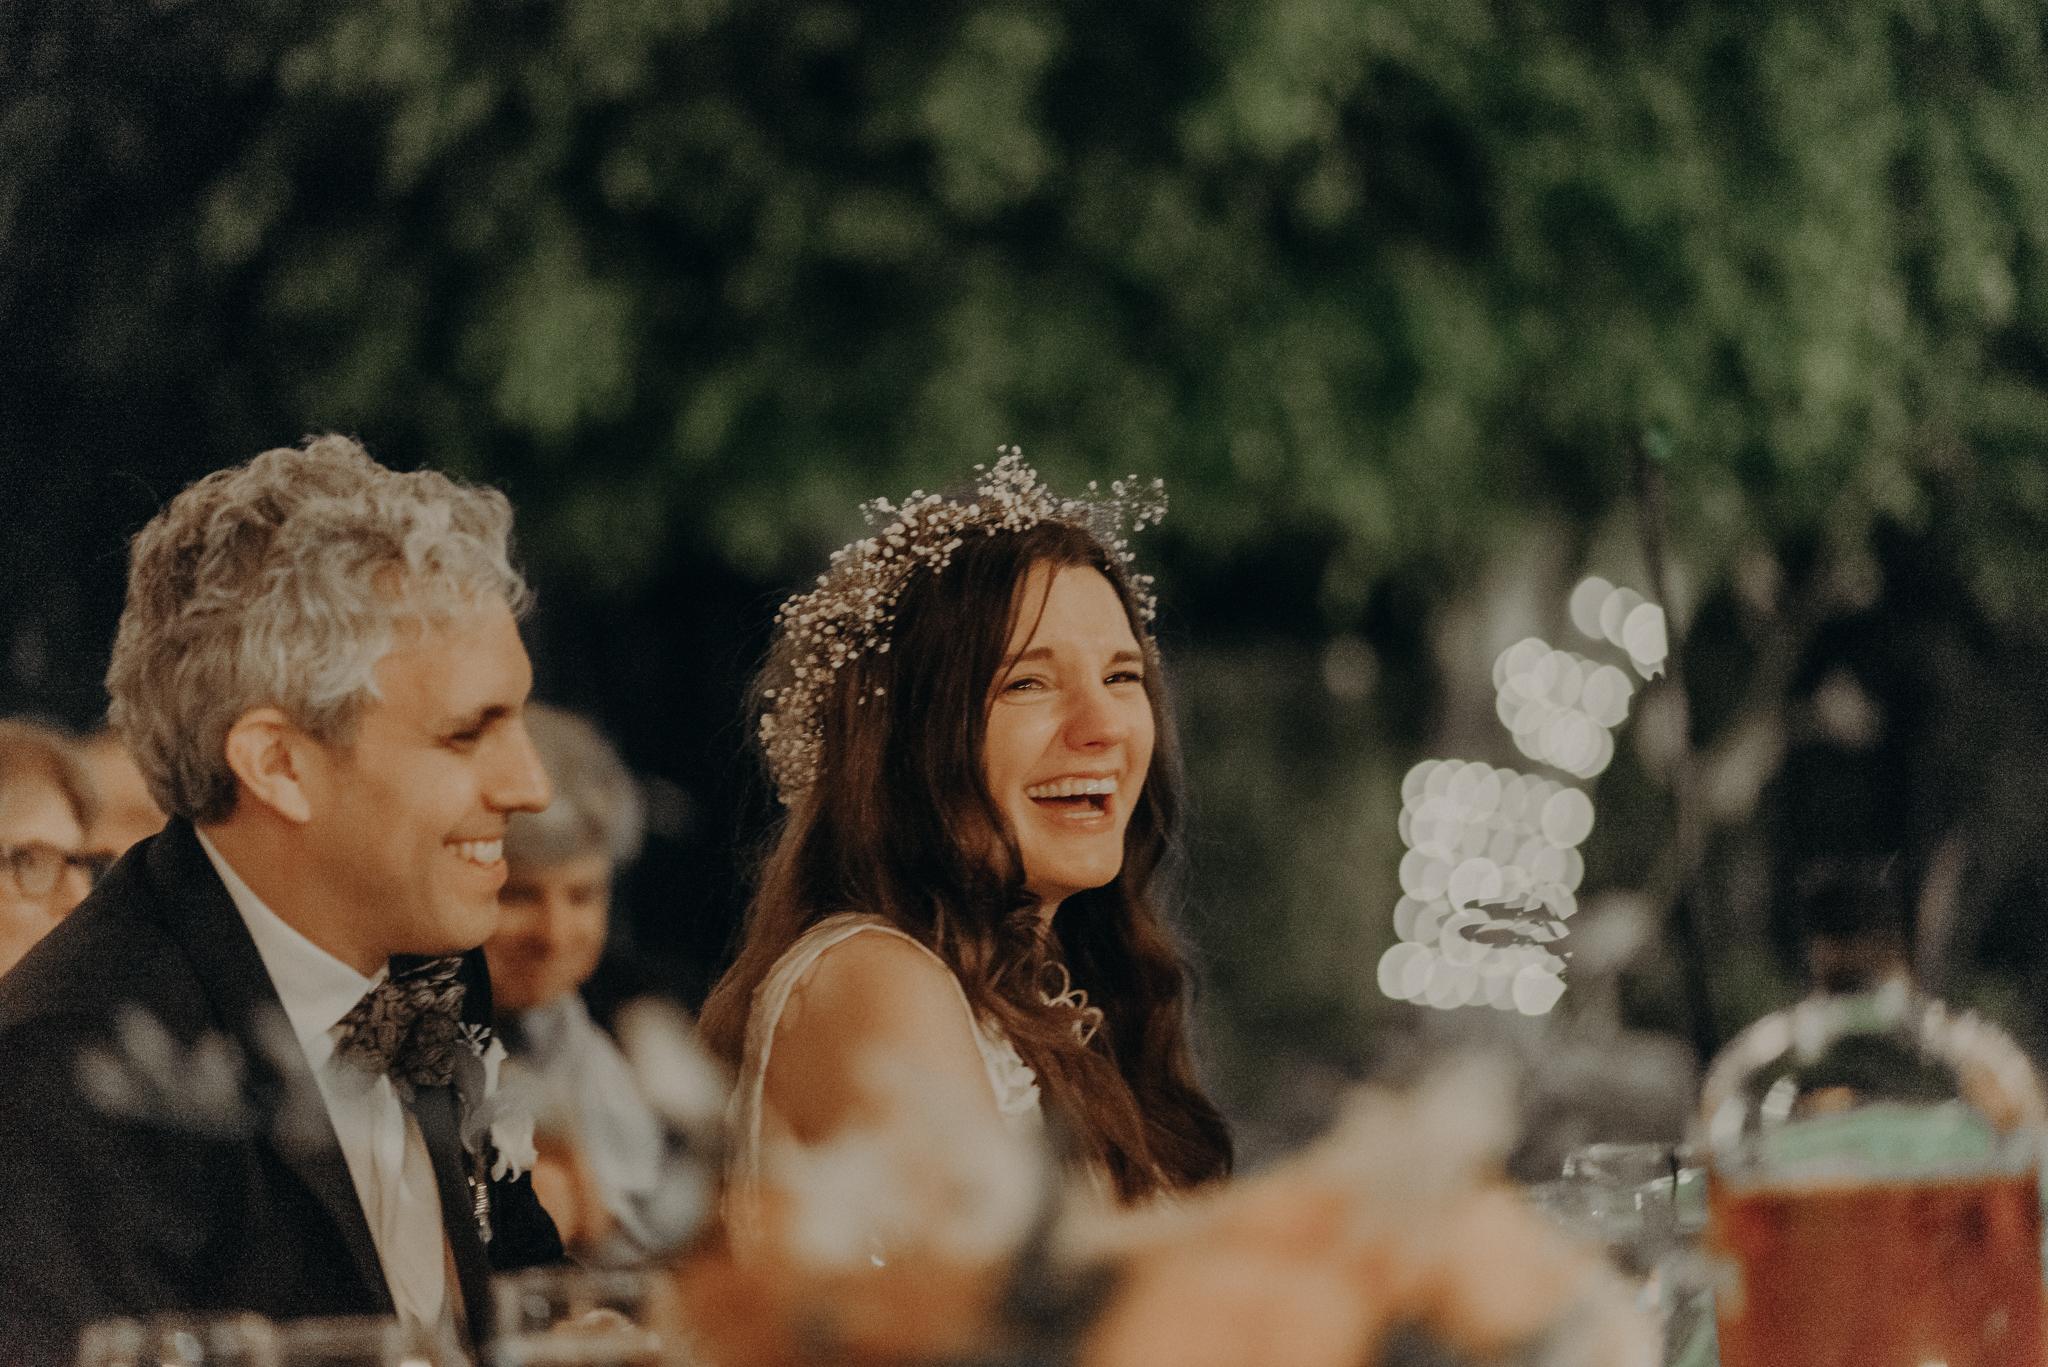 Isaiah + Taylor Photography - Private Estate Backyard Wedding - Beverly Hills - Los Angeles Wedding Photographer - 136.jpg